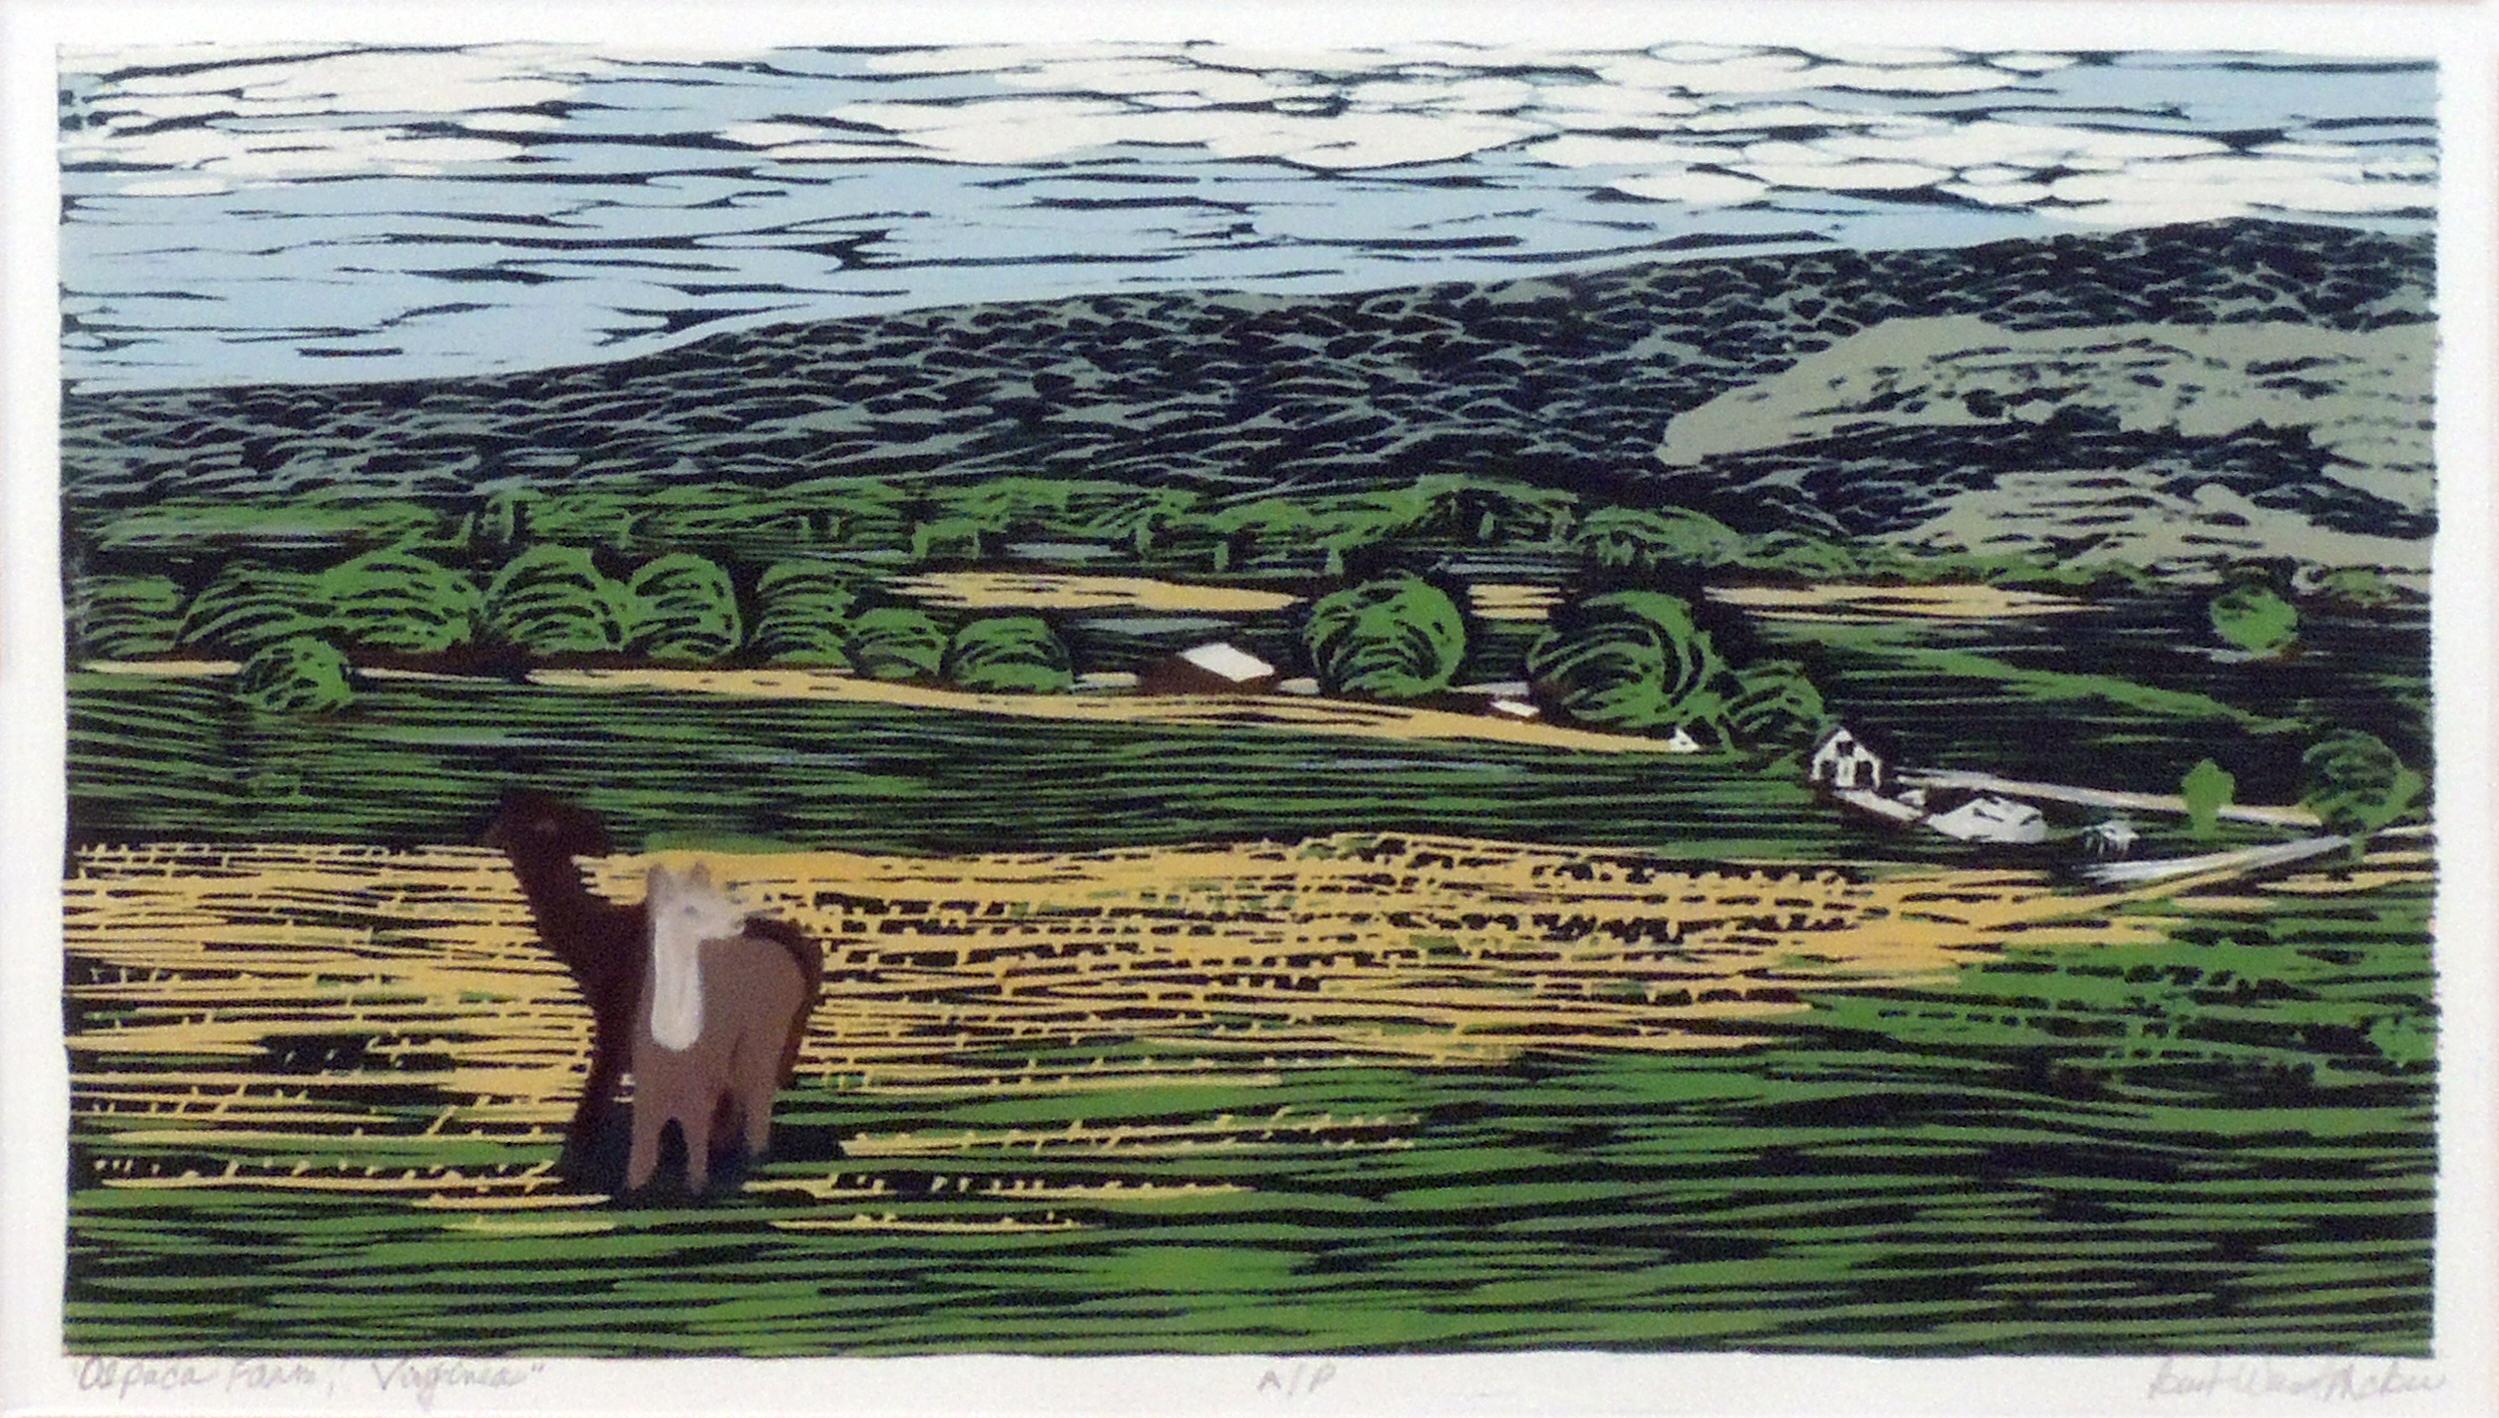 Barb Weinert-McBee | ALPACA FARM, VIRGINIA | Wood relief